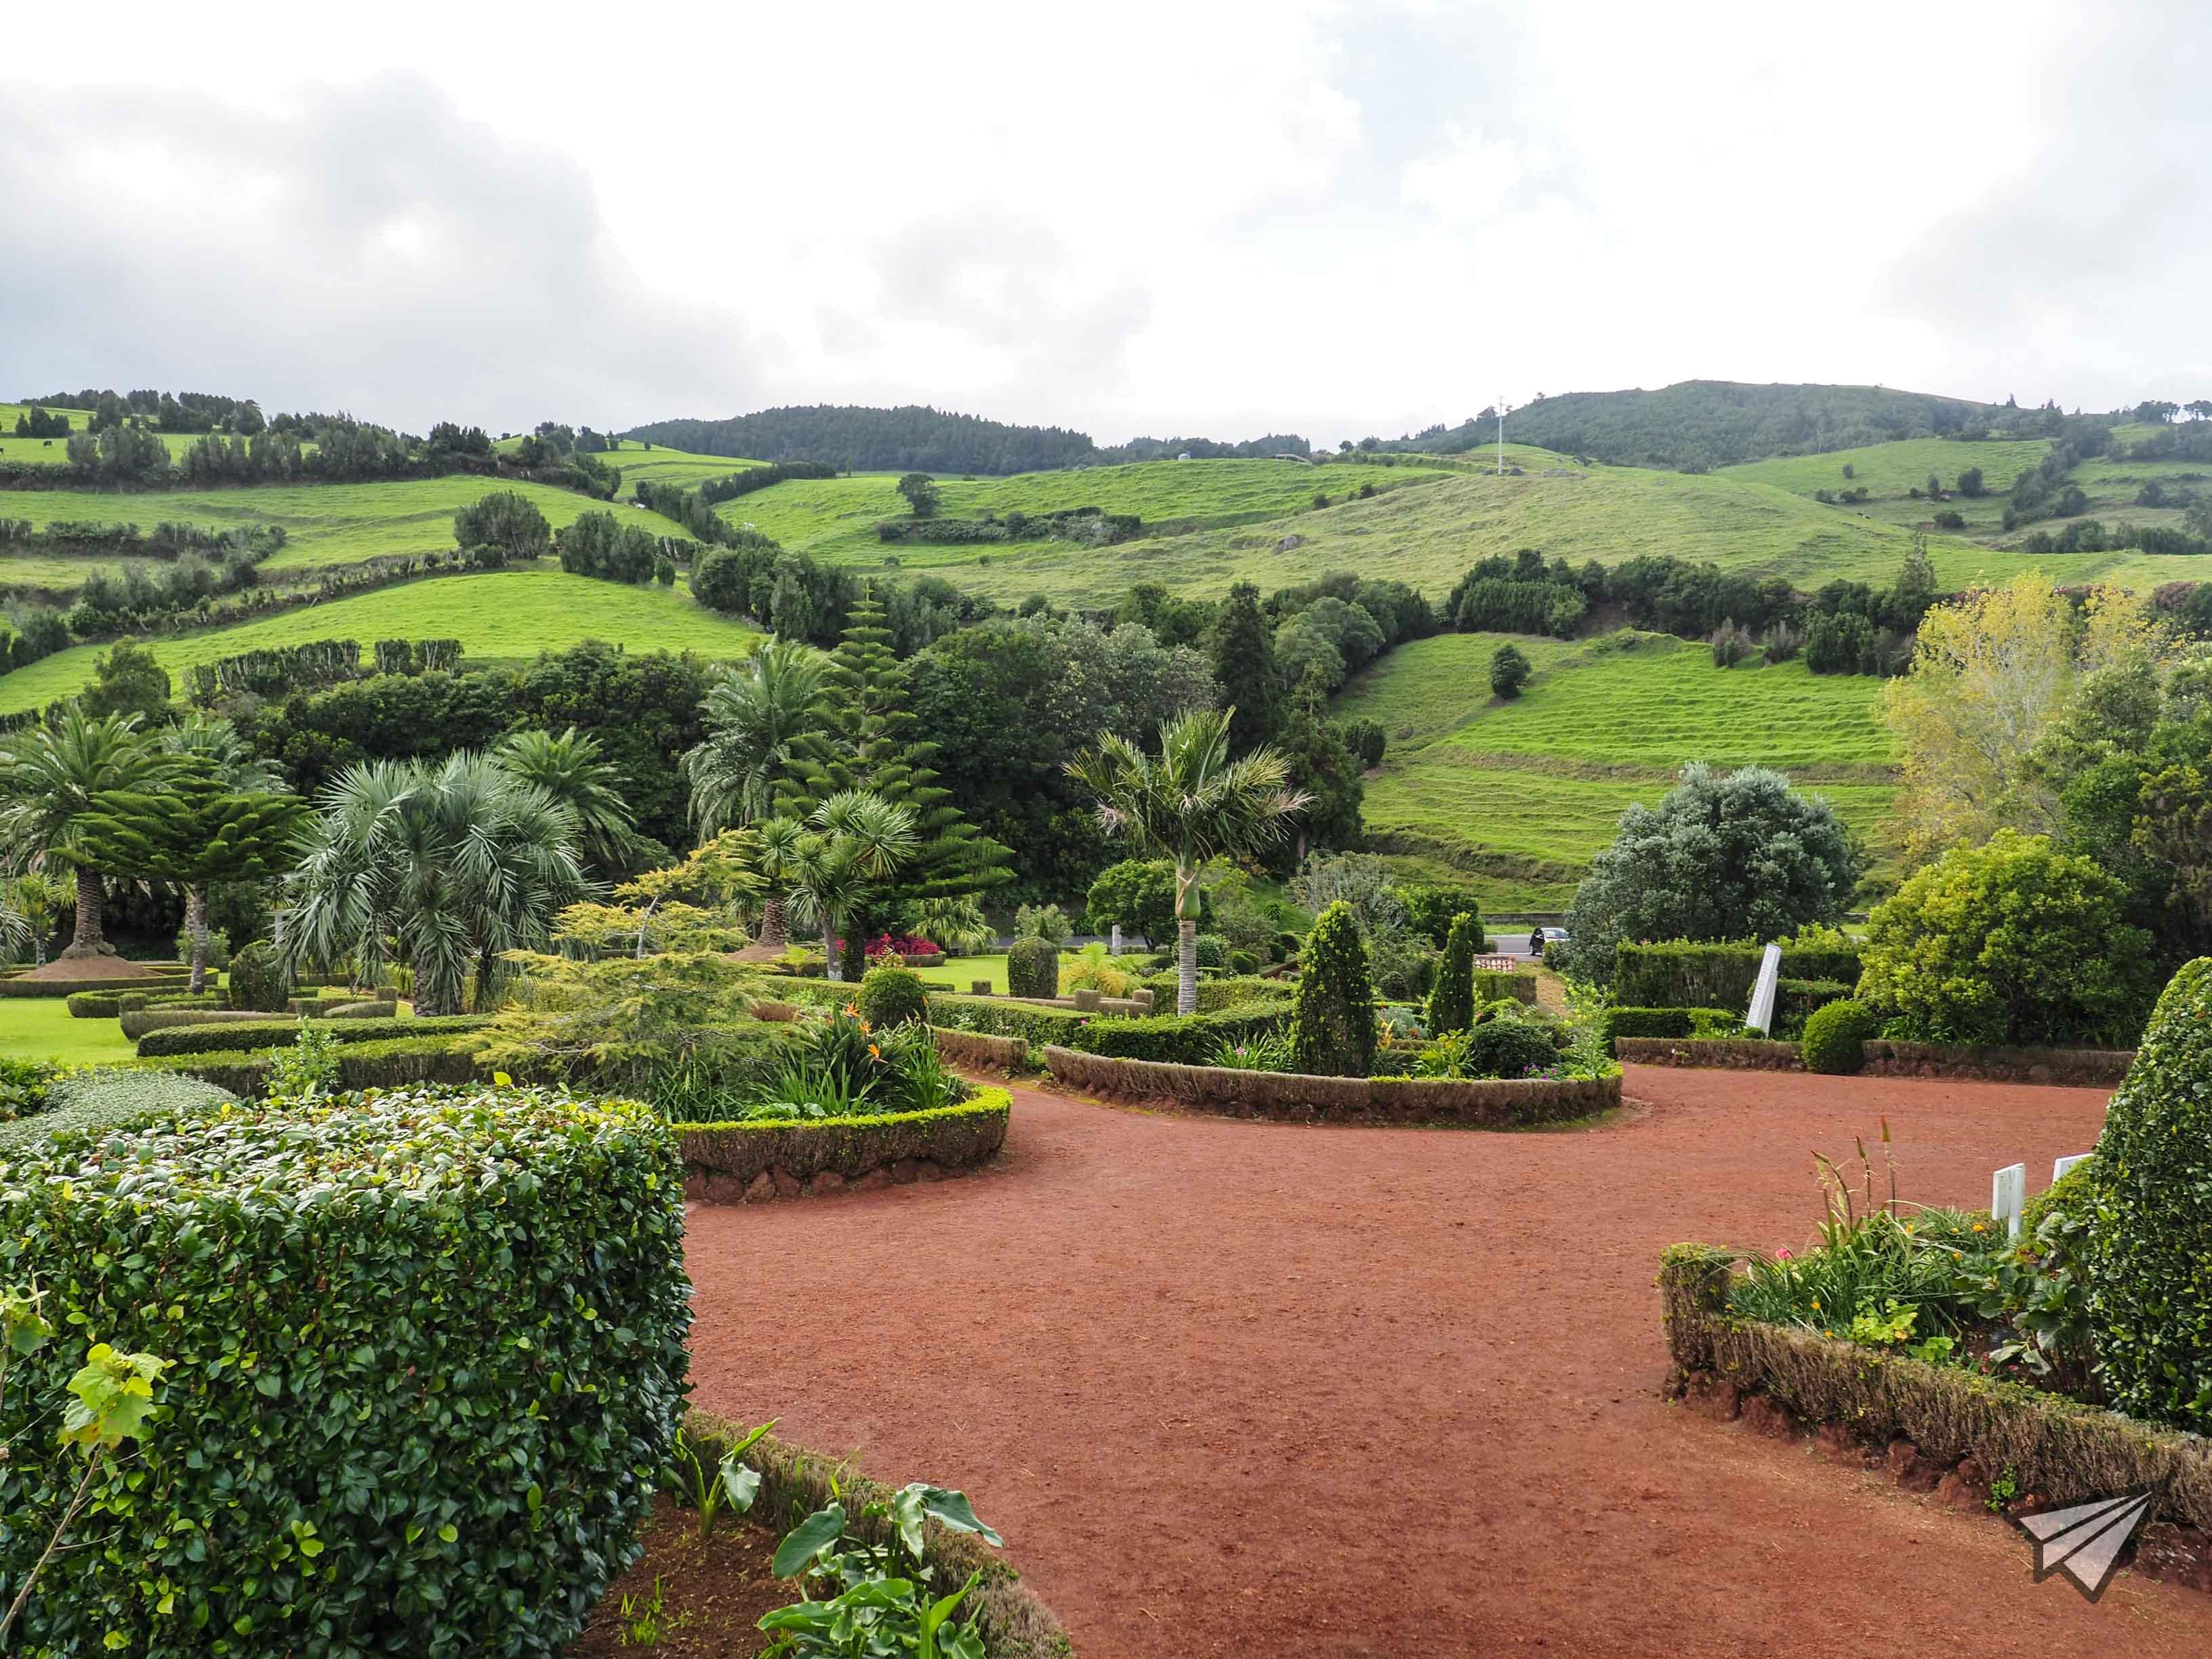 Miradouro da Ponta do Sossego градина